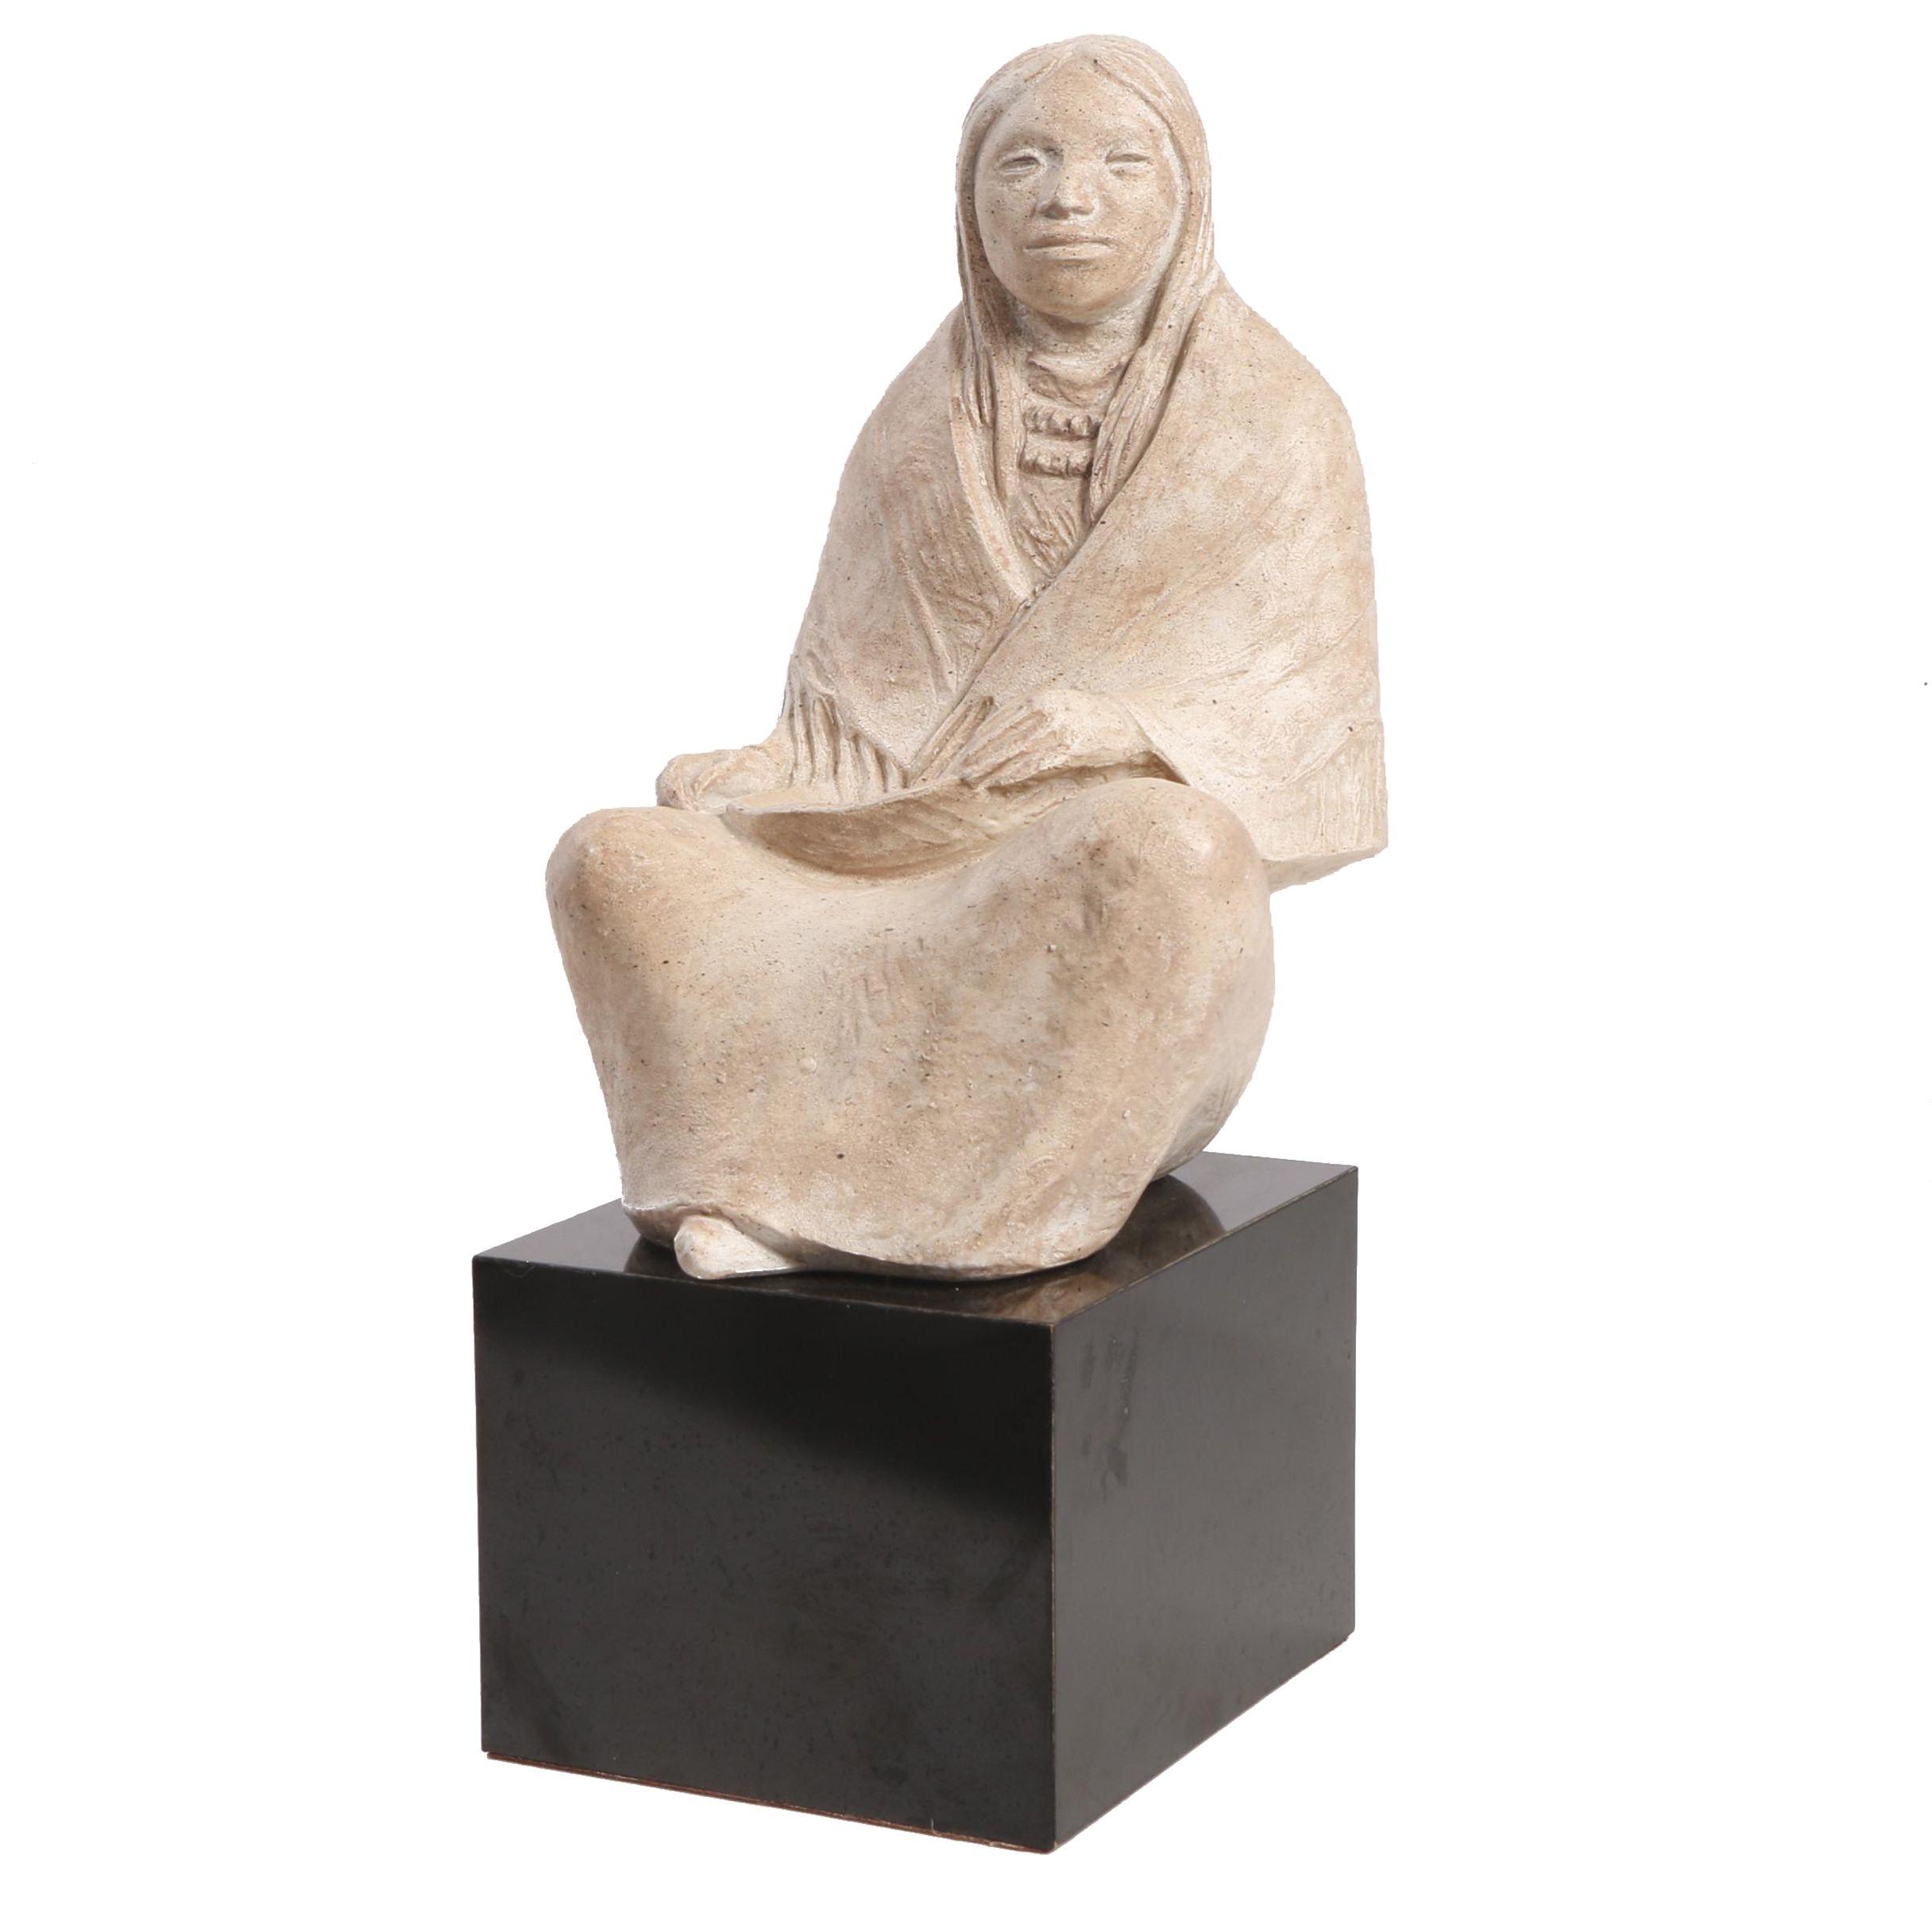 Ceramic Sculpture After James Marshall